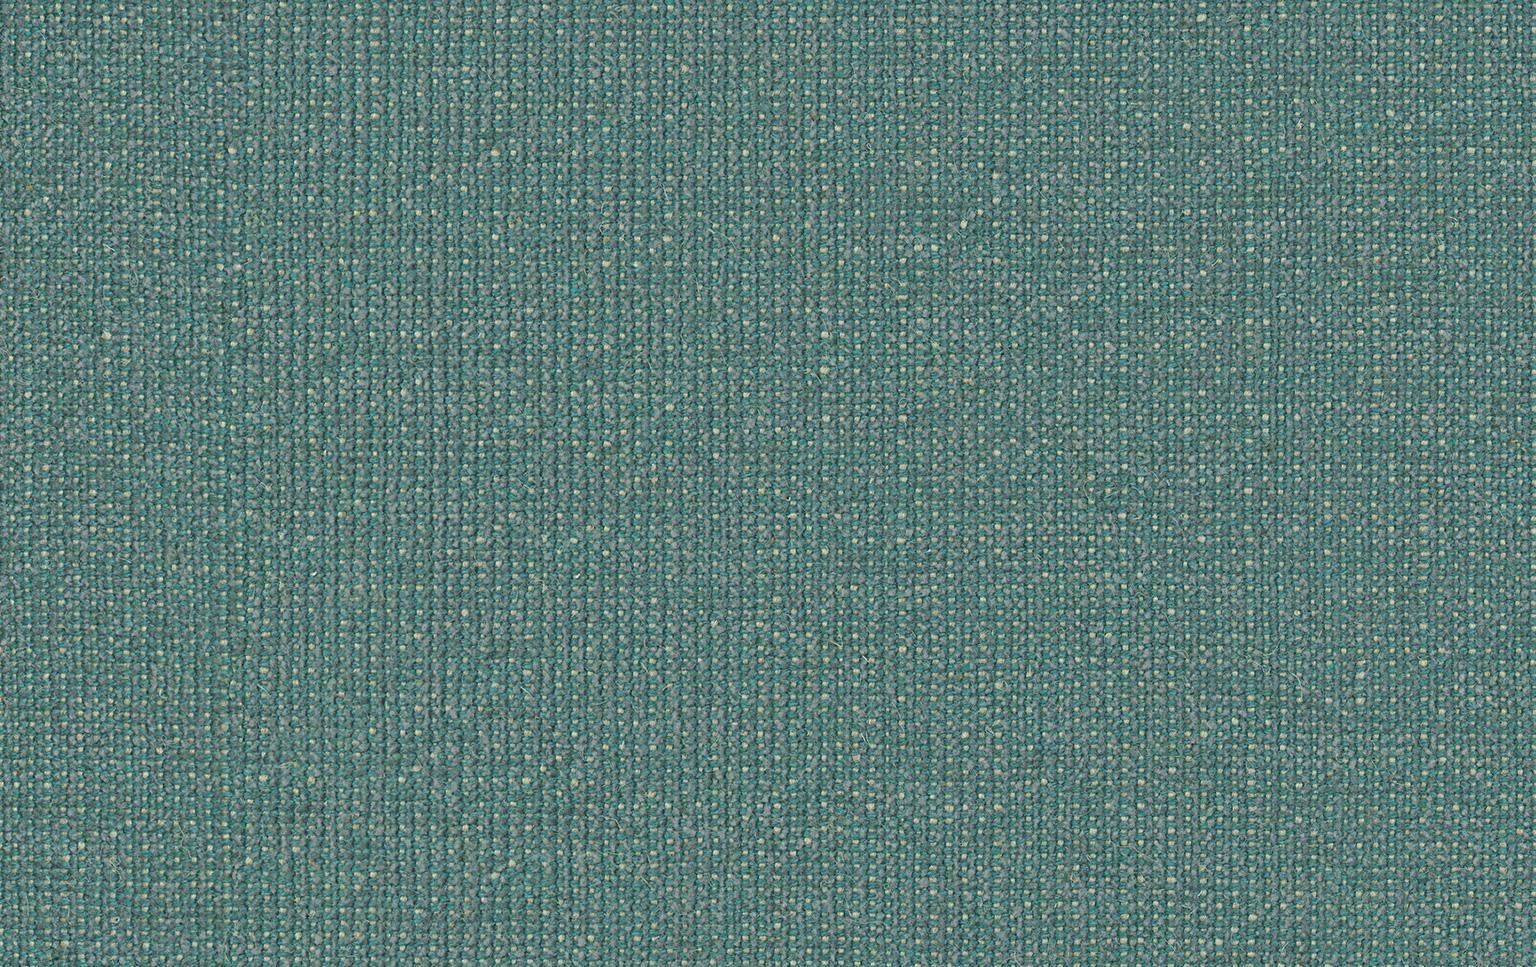 freistil Stoffmuster 6024 türkisblau